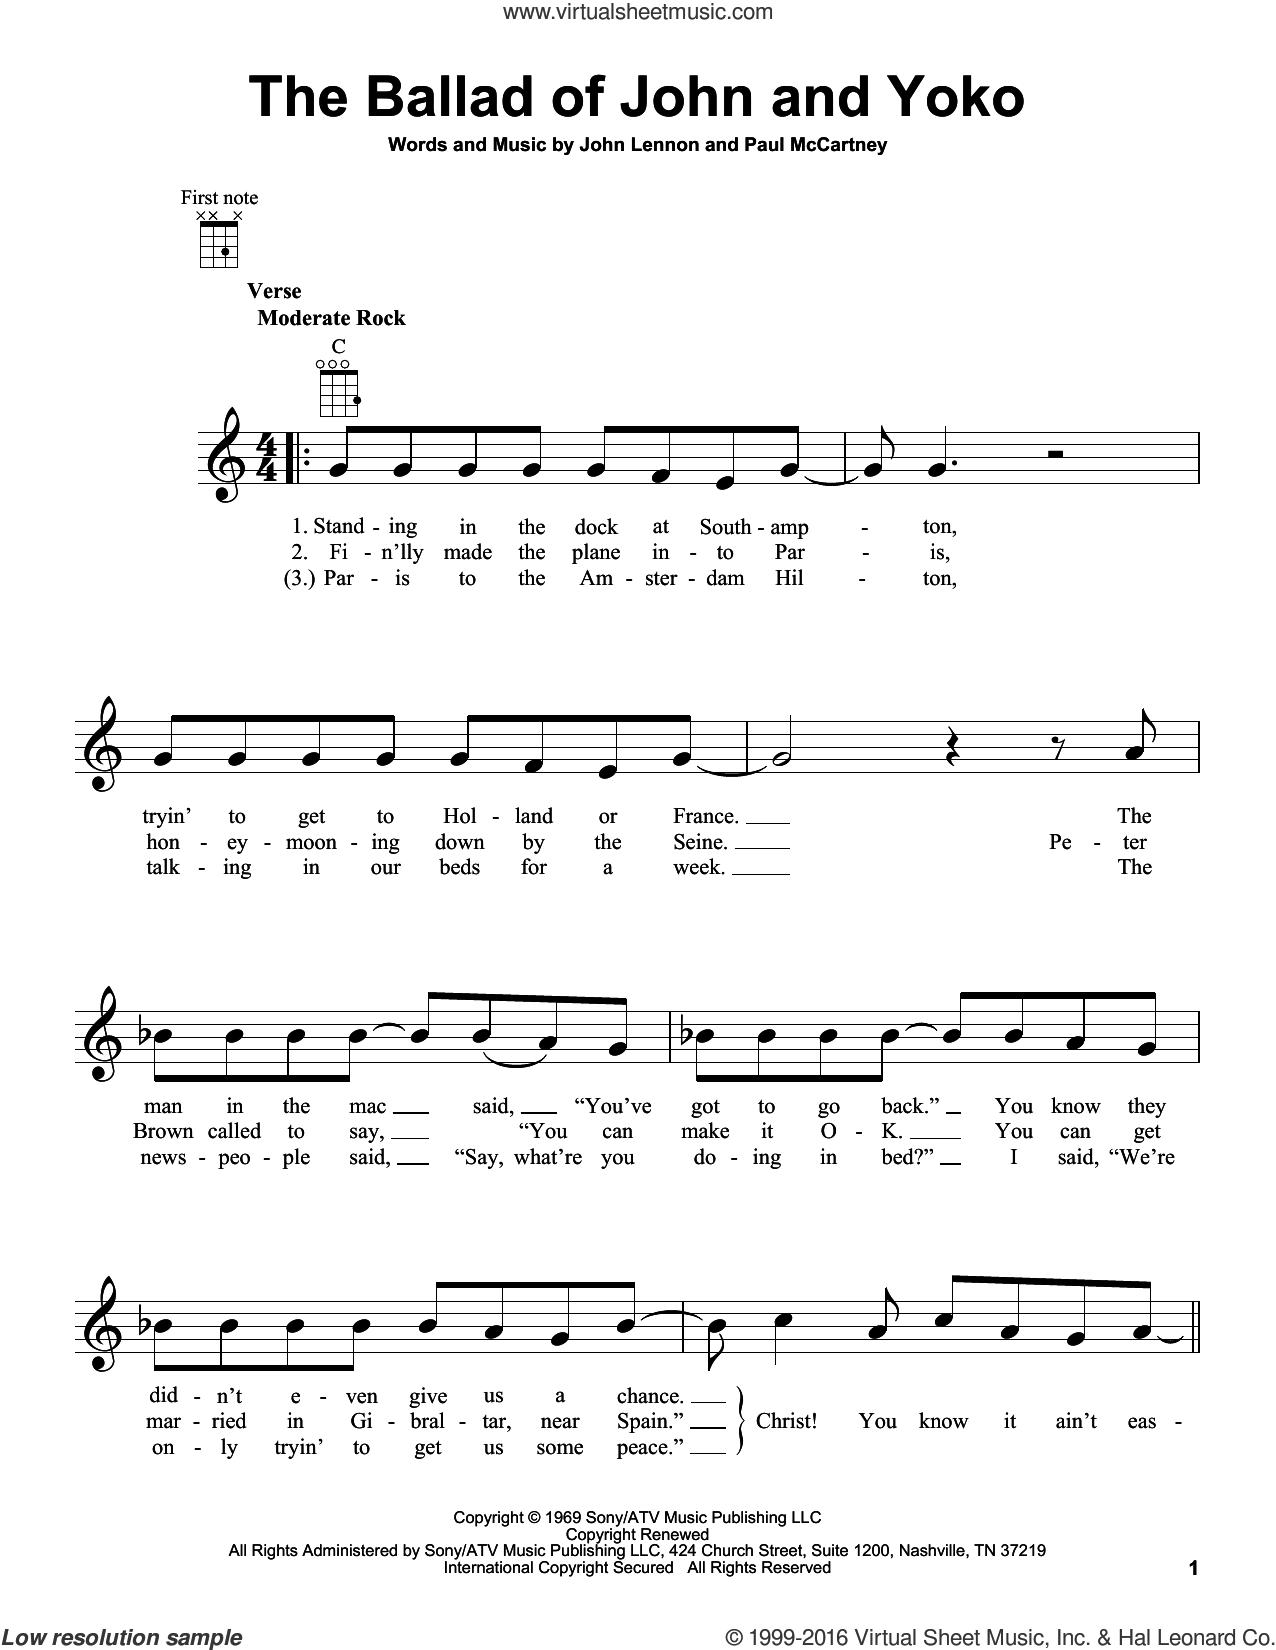 The Ballad Of John And Yoko sheet music for ukulele by The Beatles, John Lennon and Paul McCartney, intermediate skill level